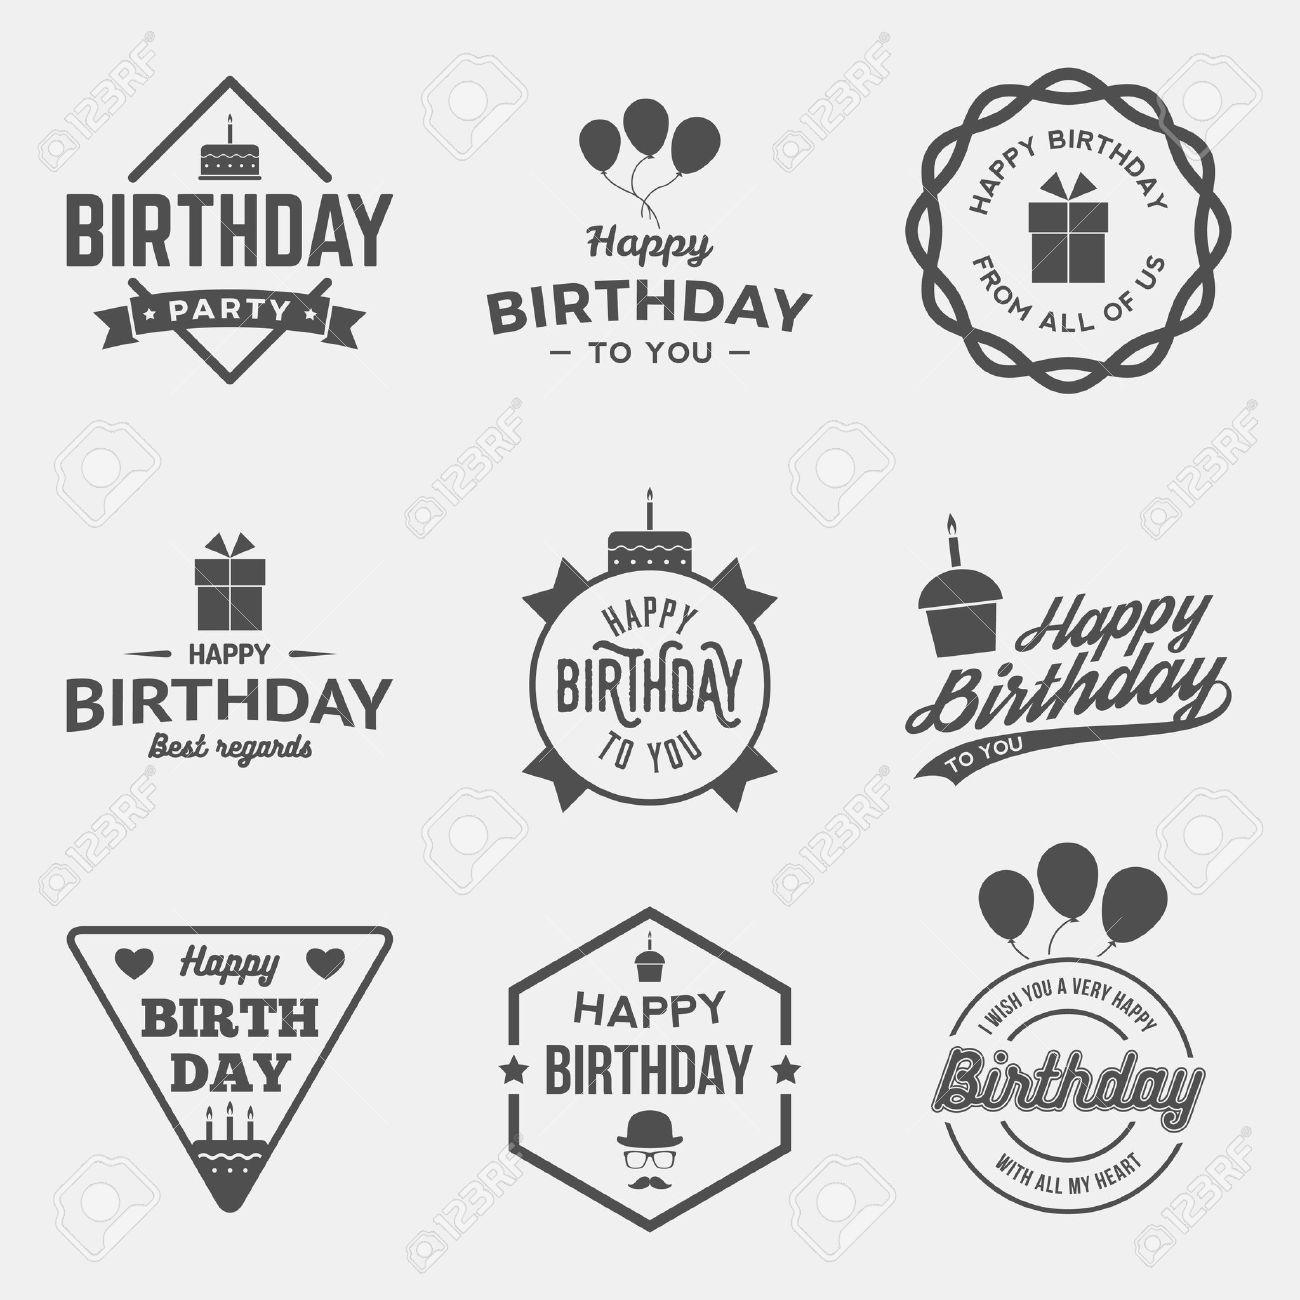 happy birthday vintage labels set. vector illustration - 42584411